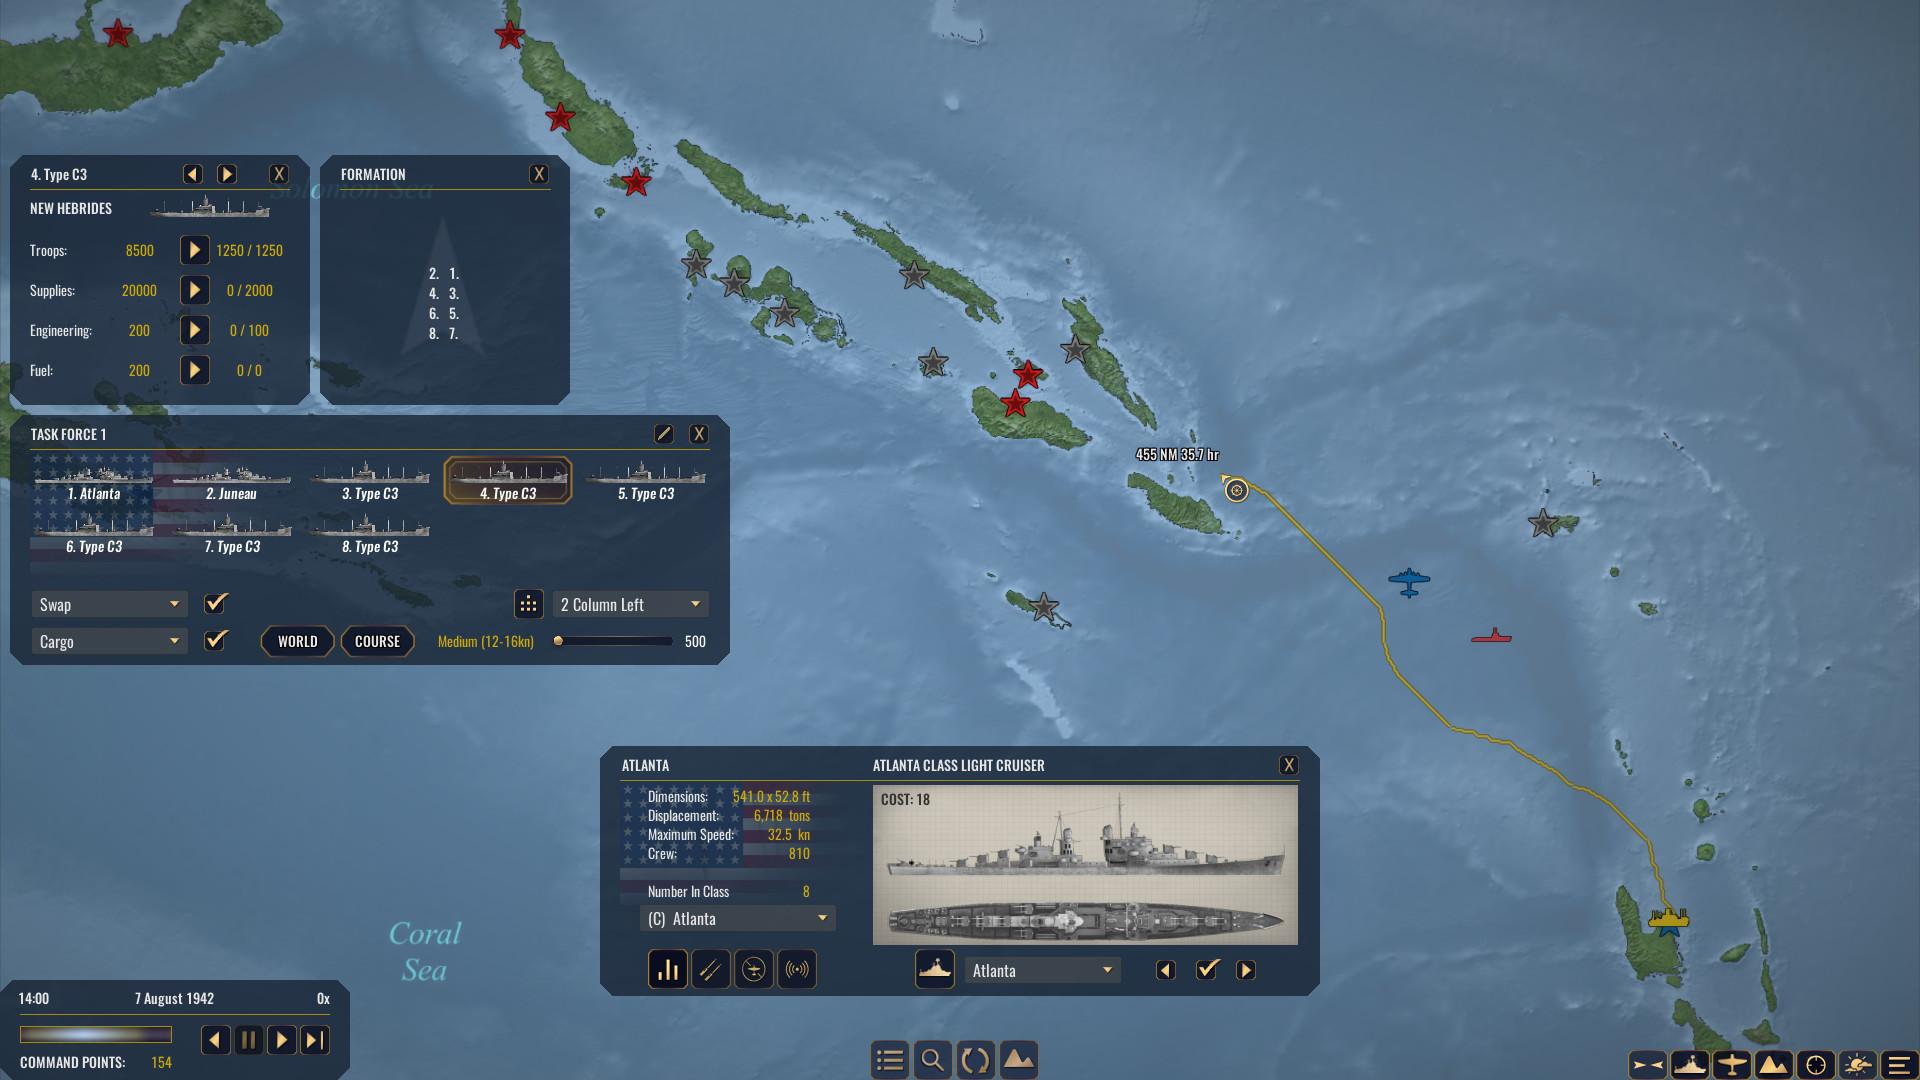 war-on-the-sea-pc-screenshot-01